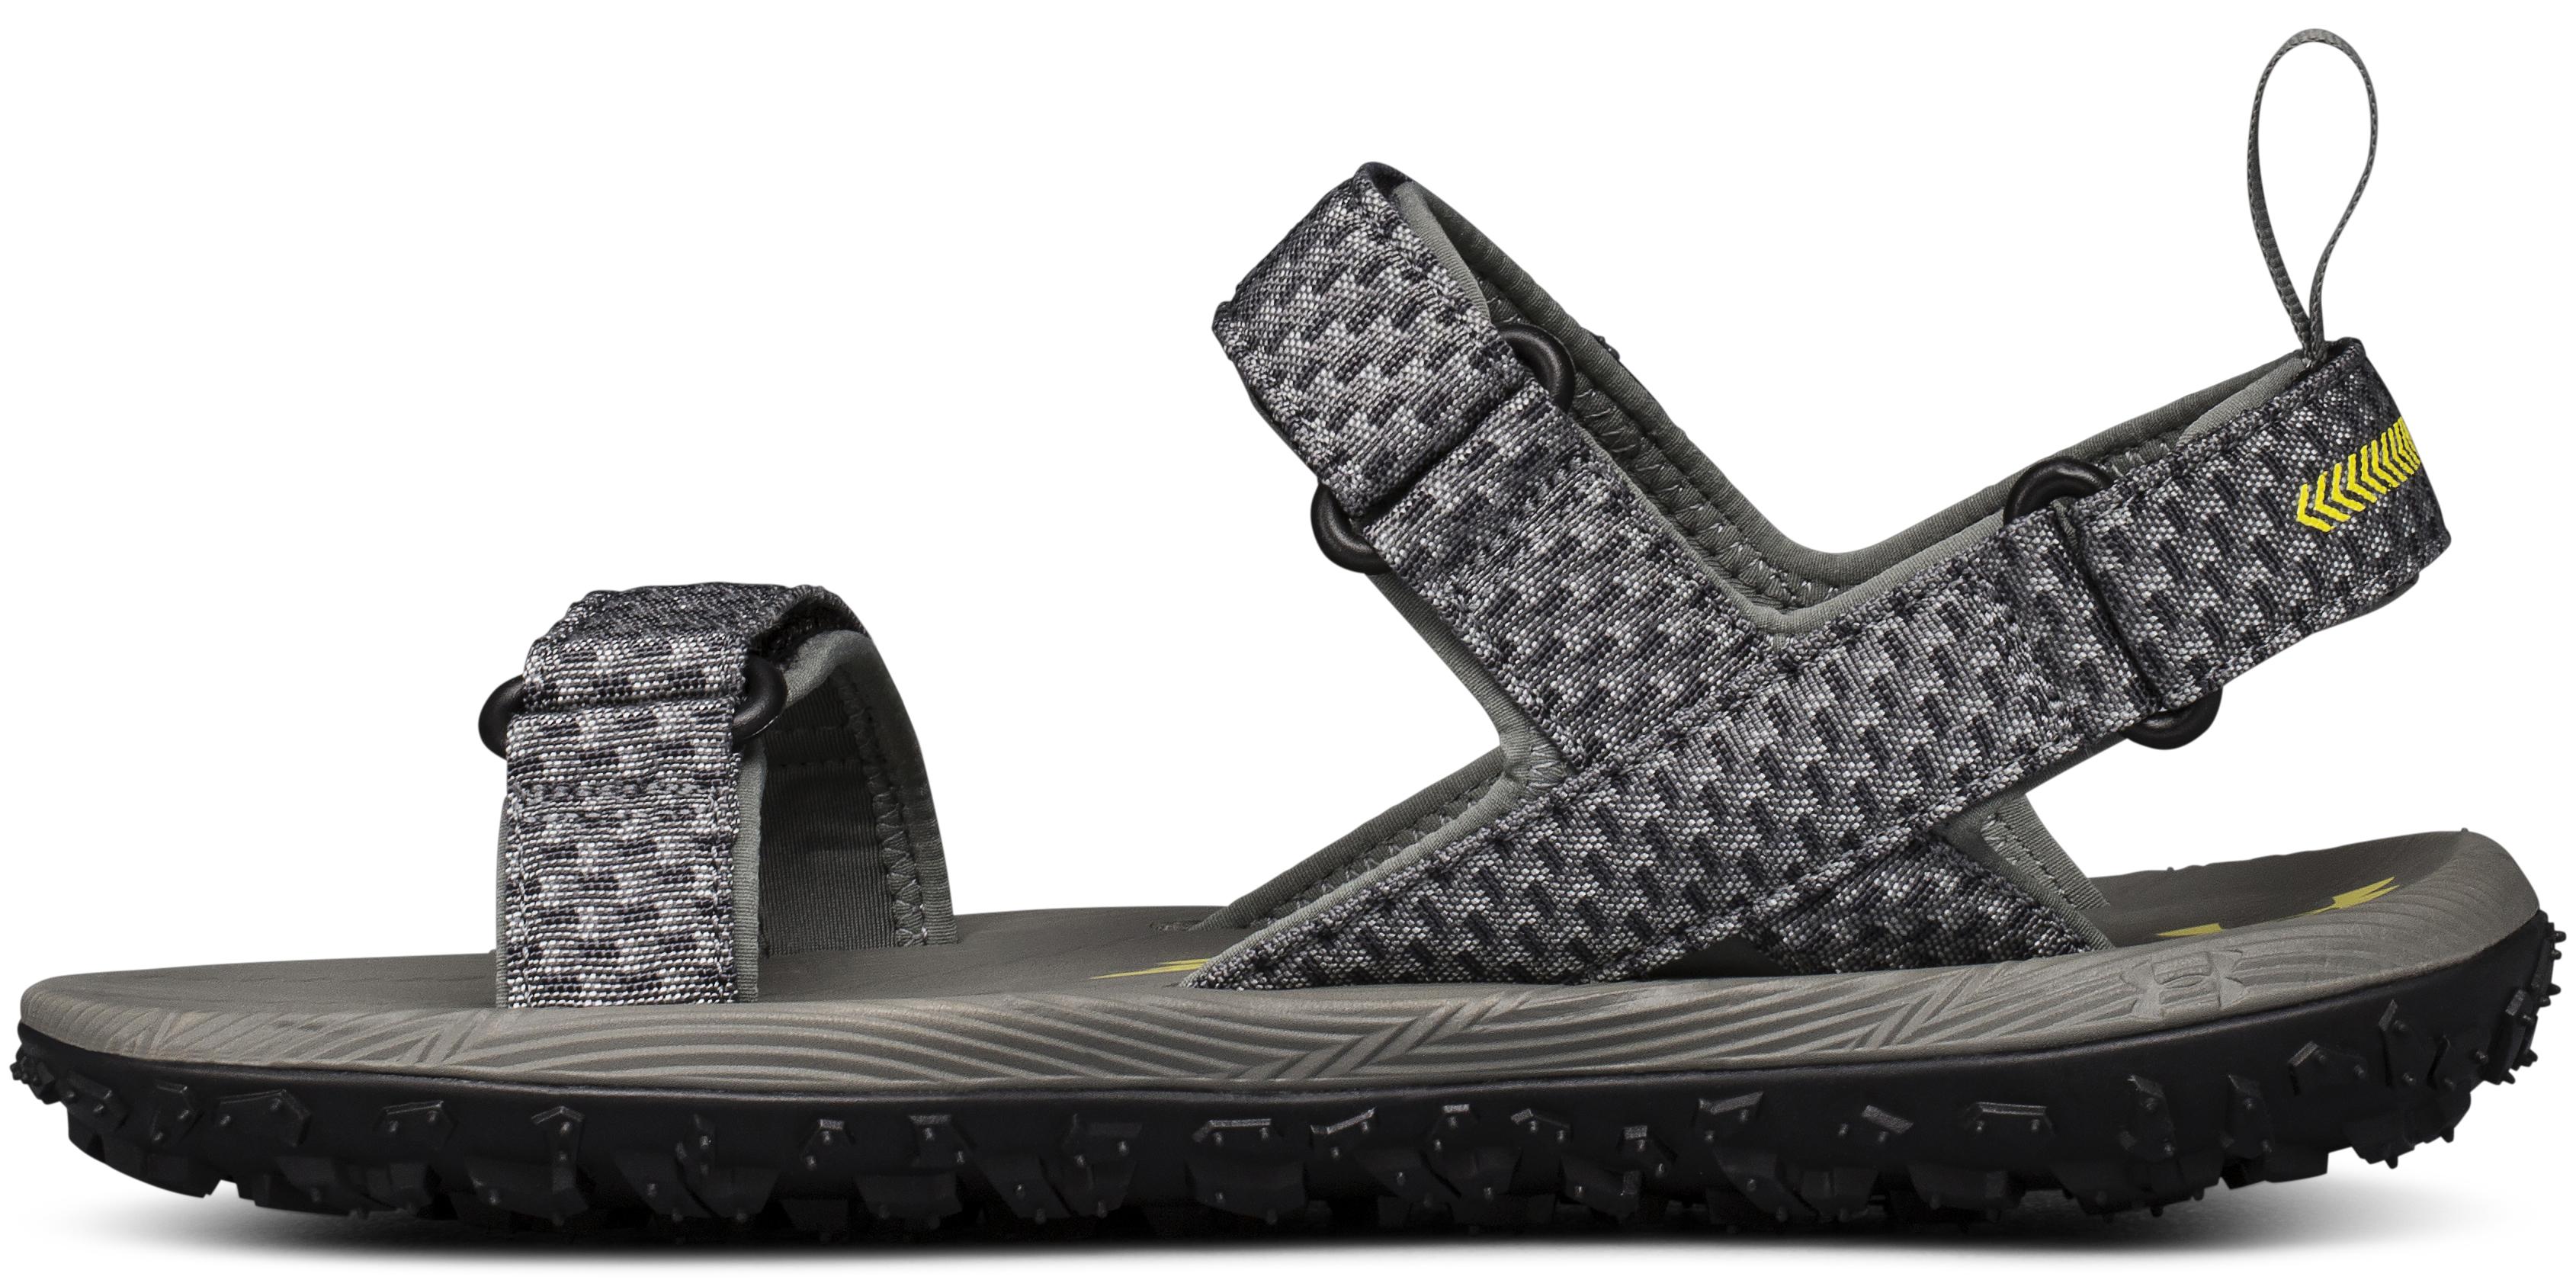 b6979ce9dd1e Murdoch s – Under Armour - Men s UA Fat Tire Sandal